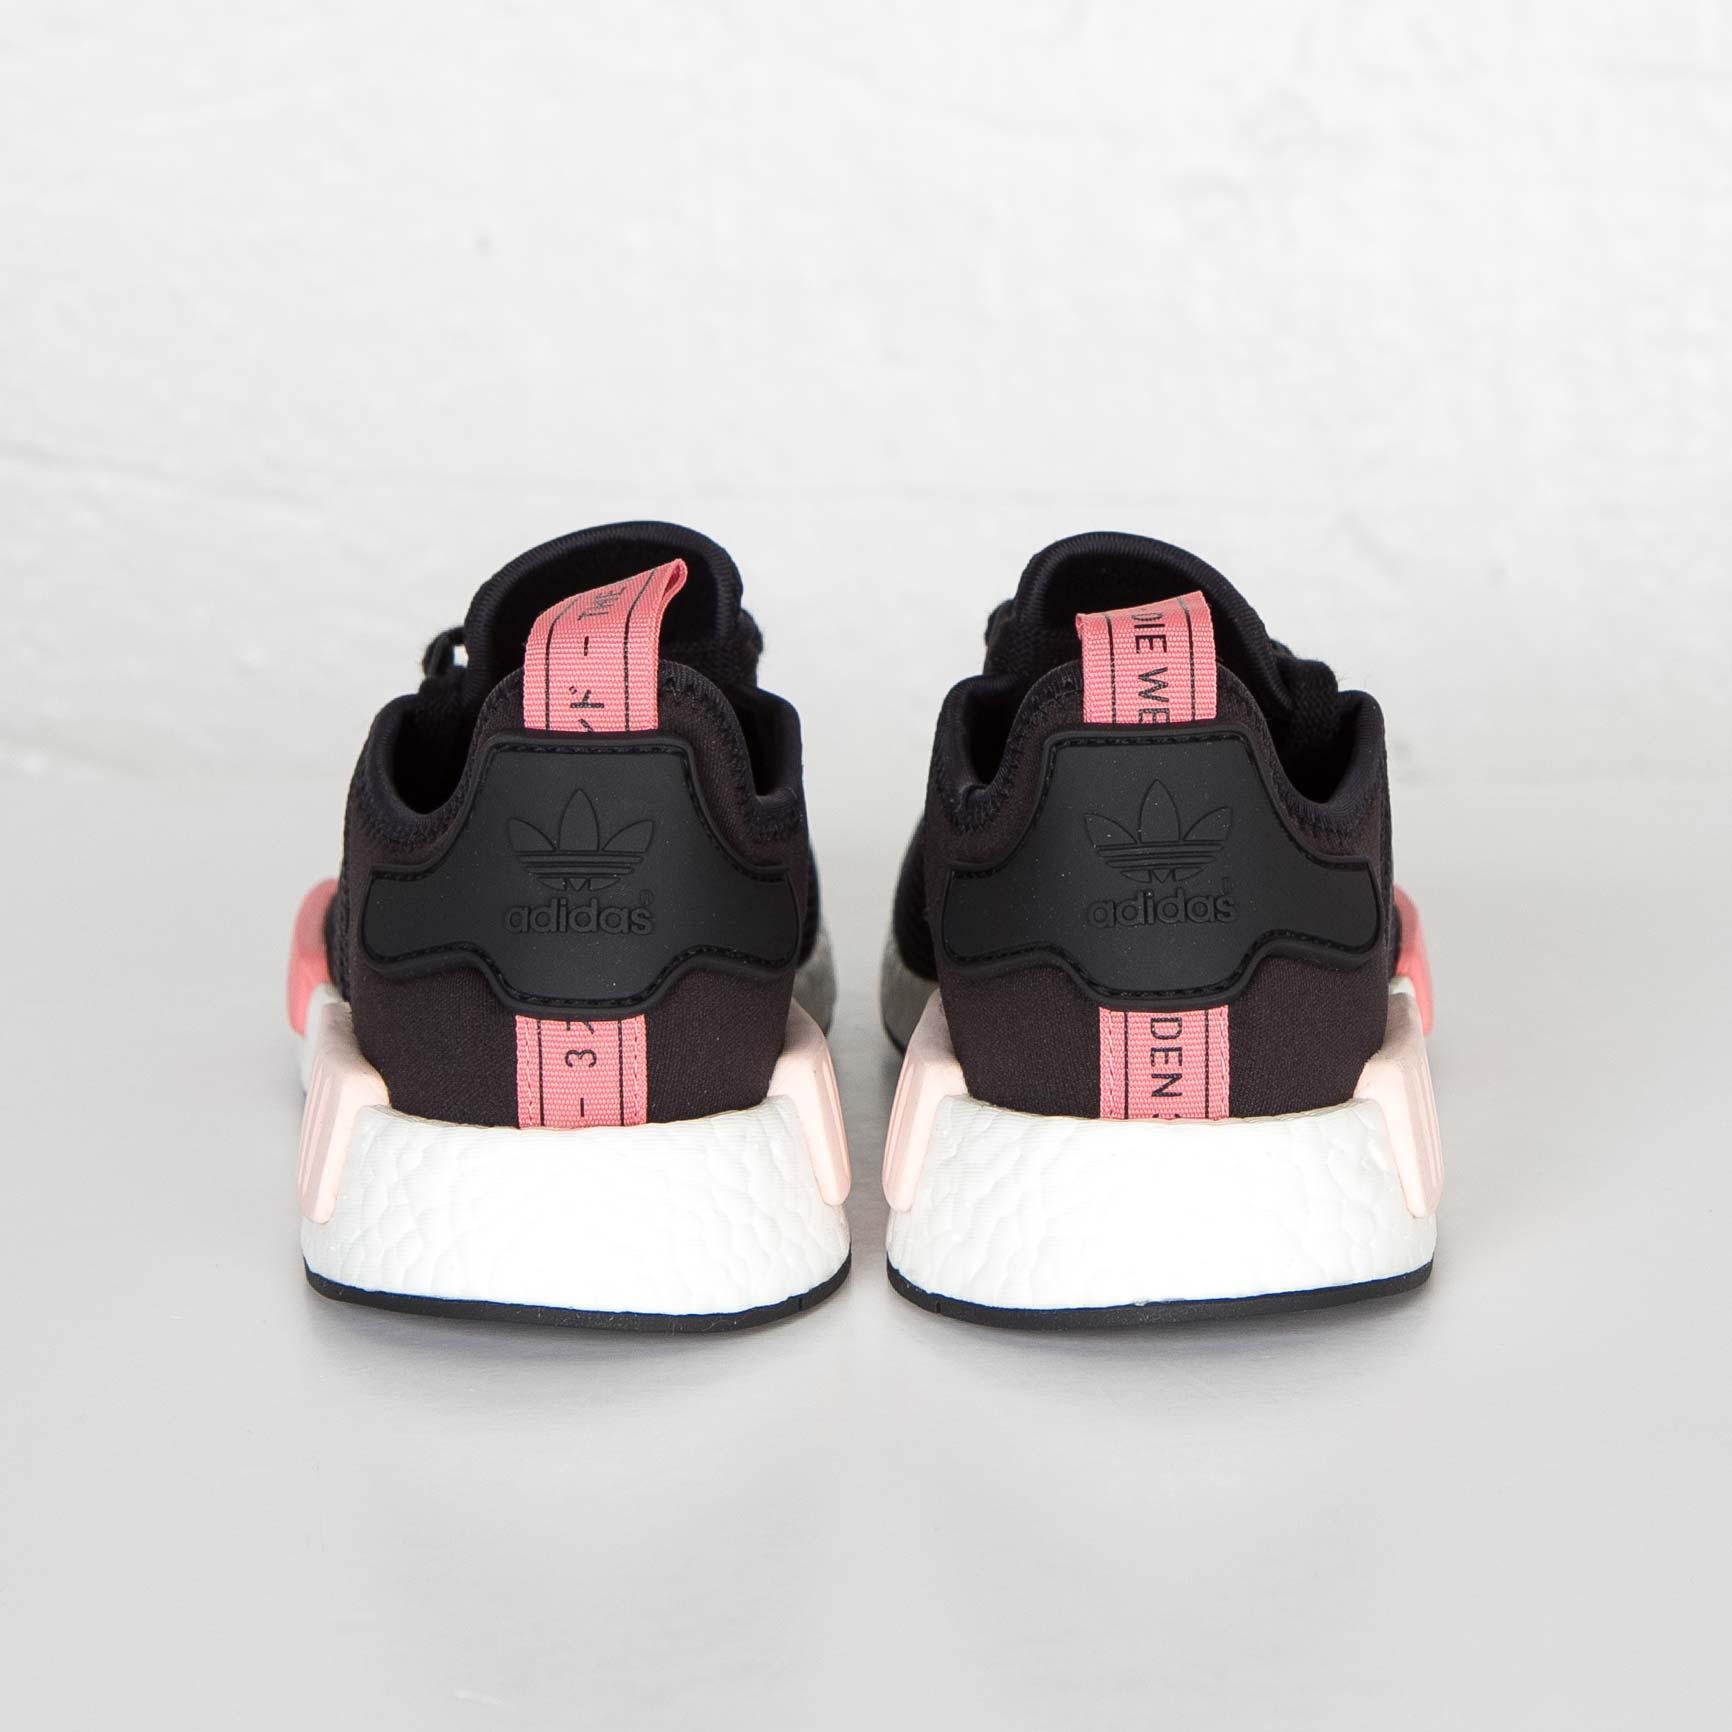 f9fc95f276dce adidas NMD R1 W - S75234 - Sneakersnstuff